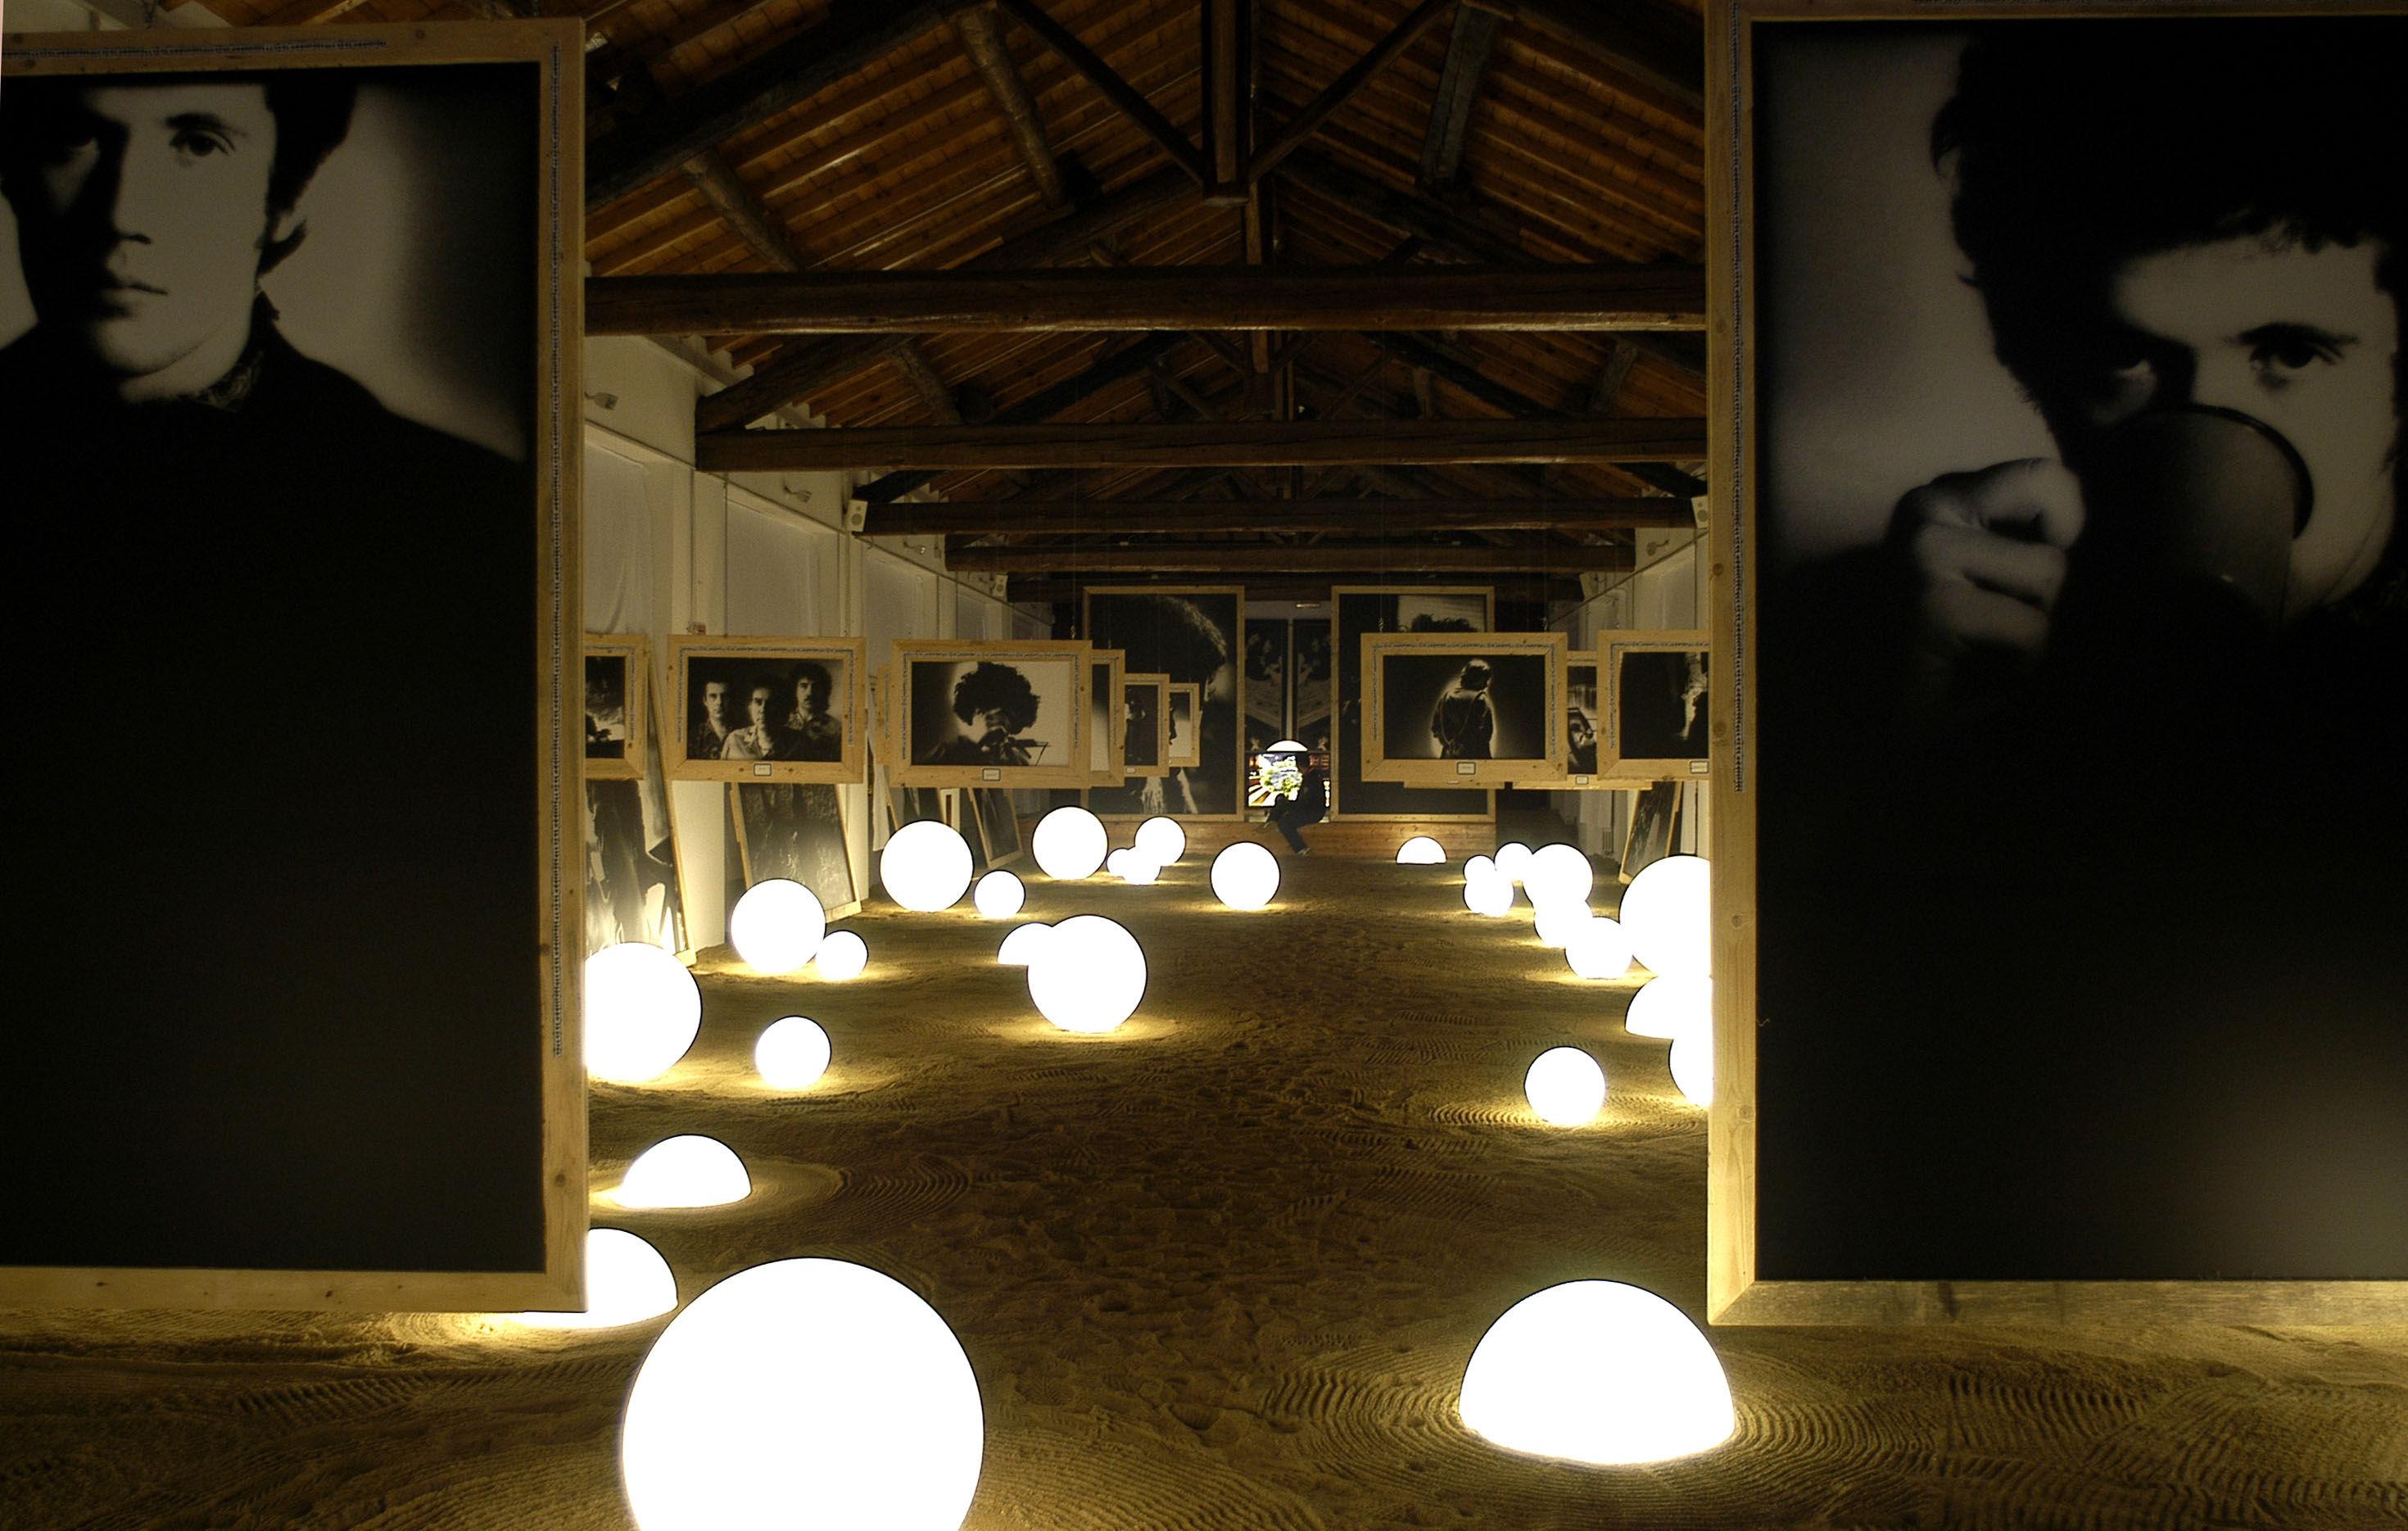 Lampada senza fili globo outdoor led slide bianco esterno Ø 50